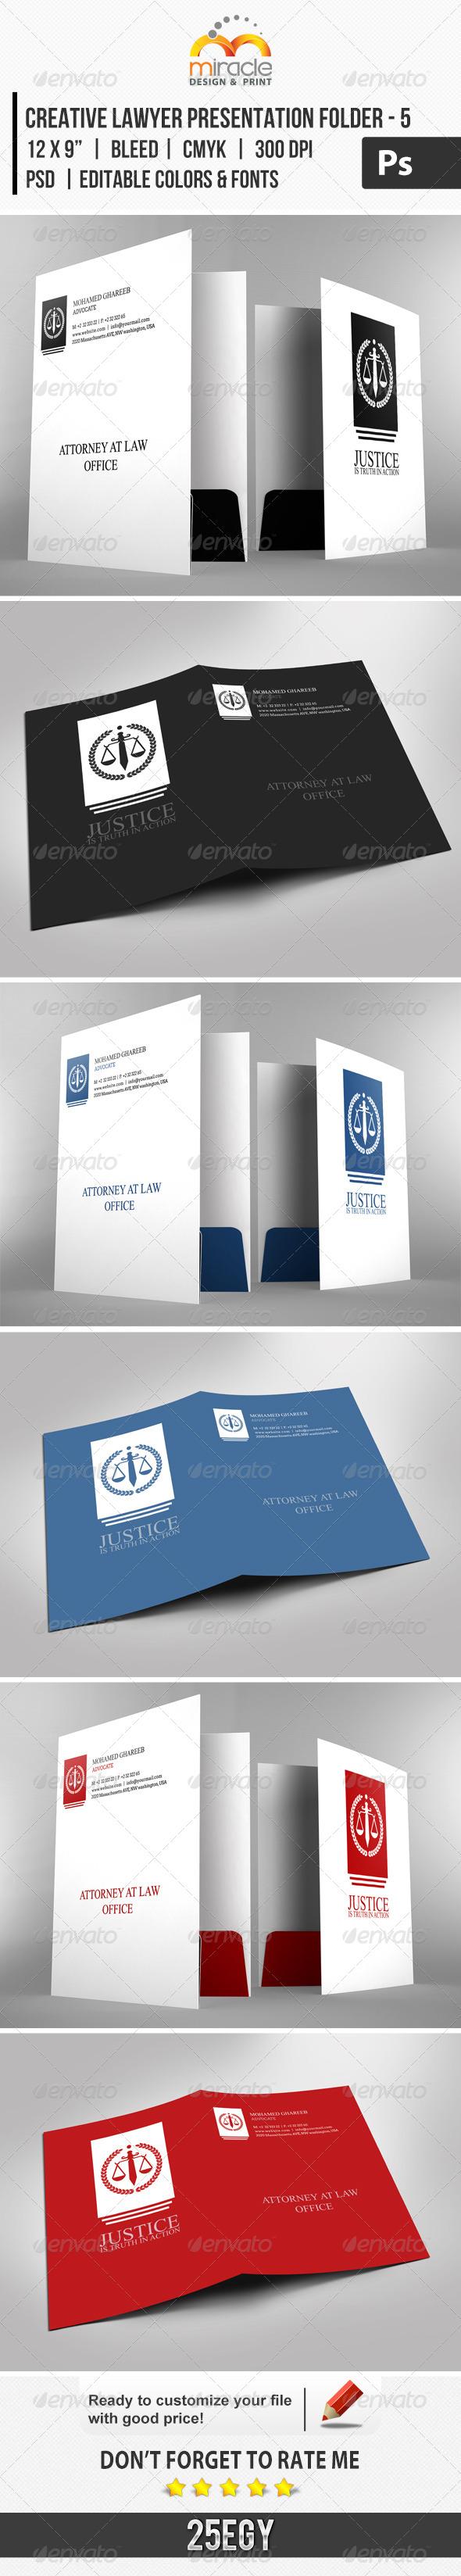 Creative Lawyer Presentation Folder #5 - Stationery Print Templates